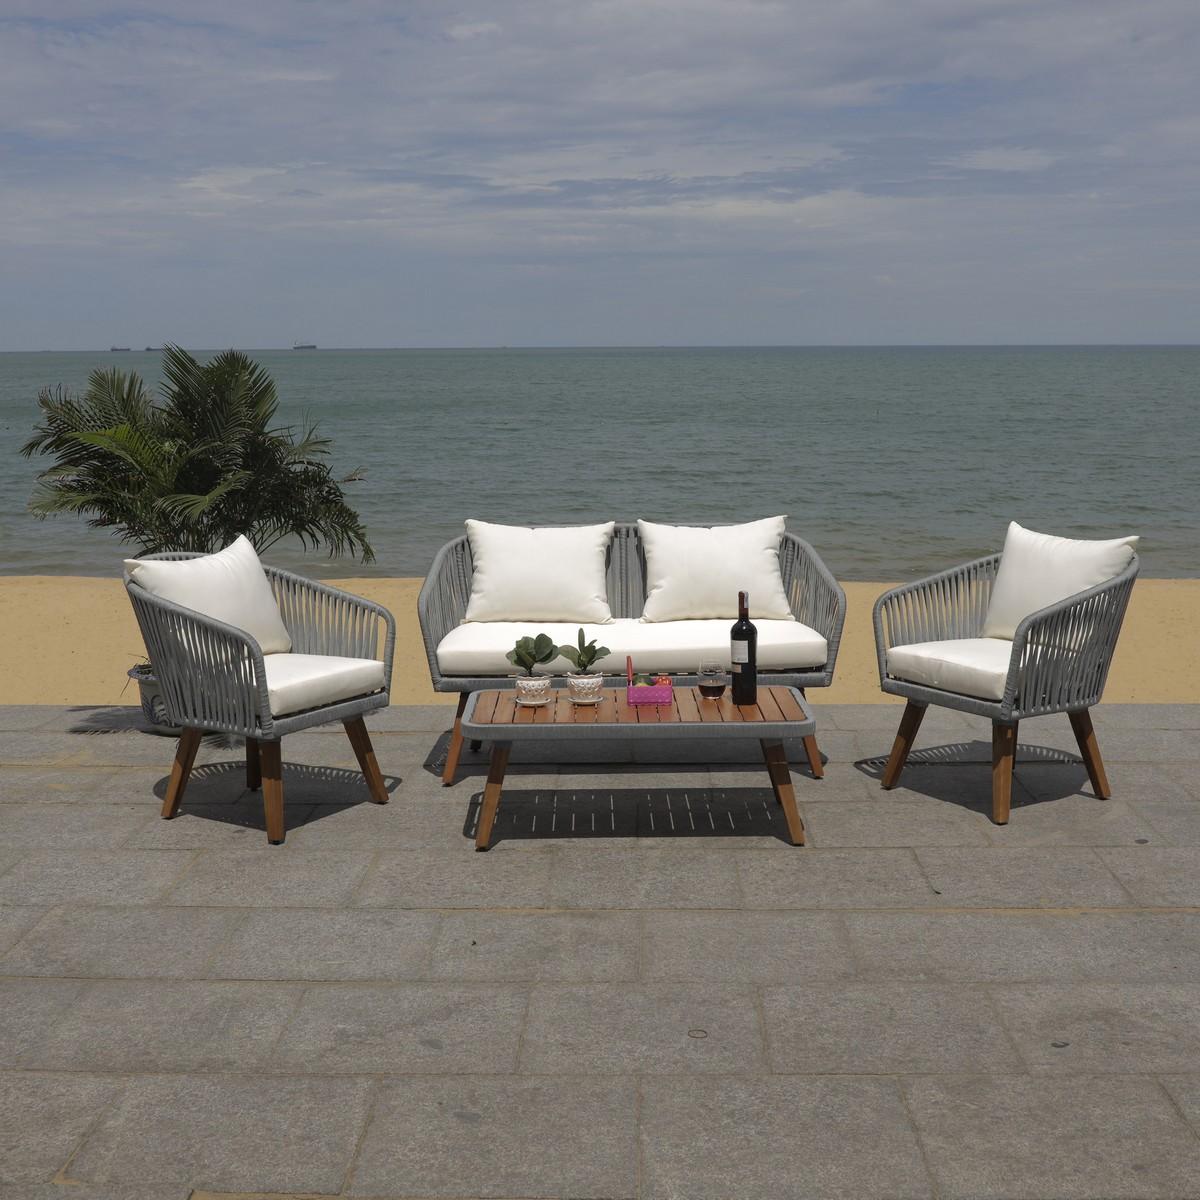 PAT7074A Patio Sets - 4 Piece - Furniture by Safavieh on Safavieh Ransin id=46492